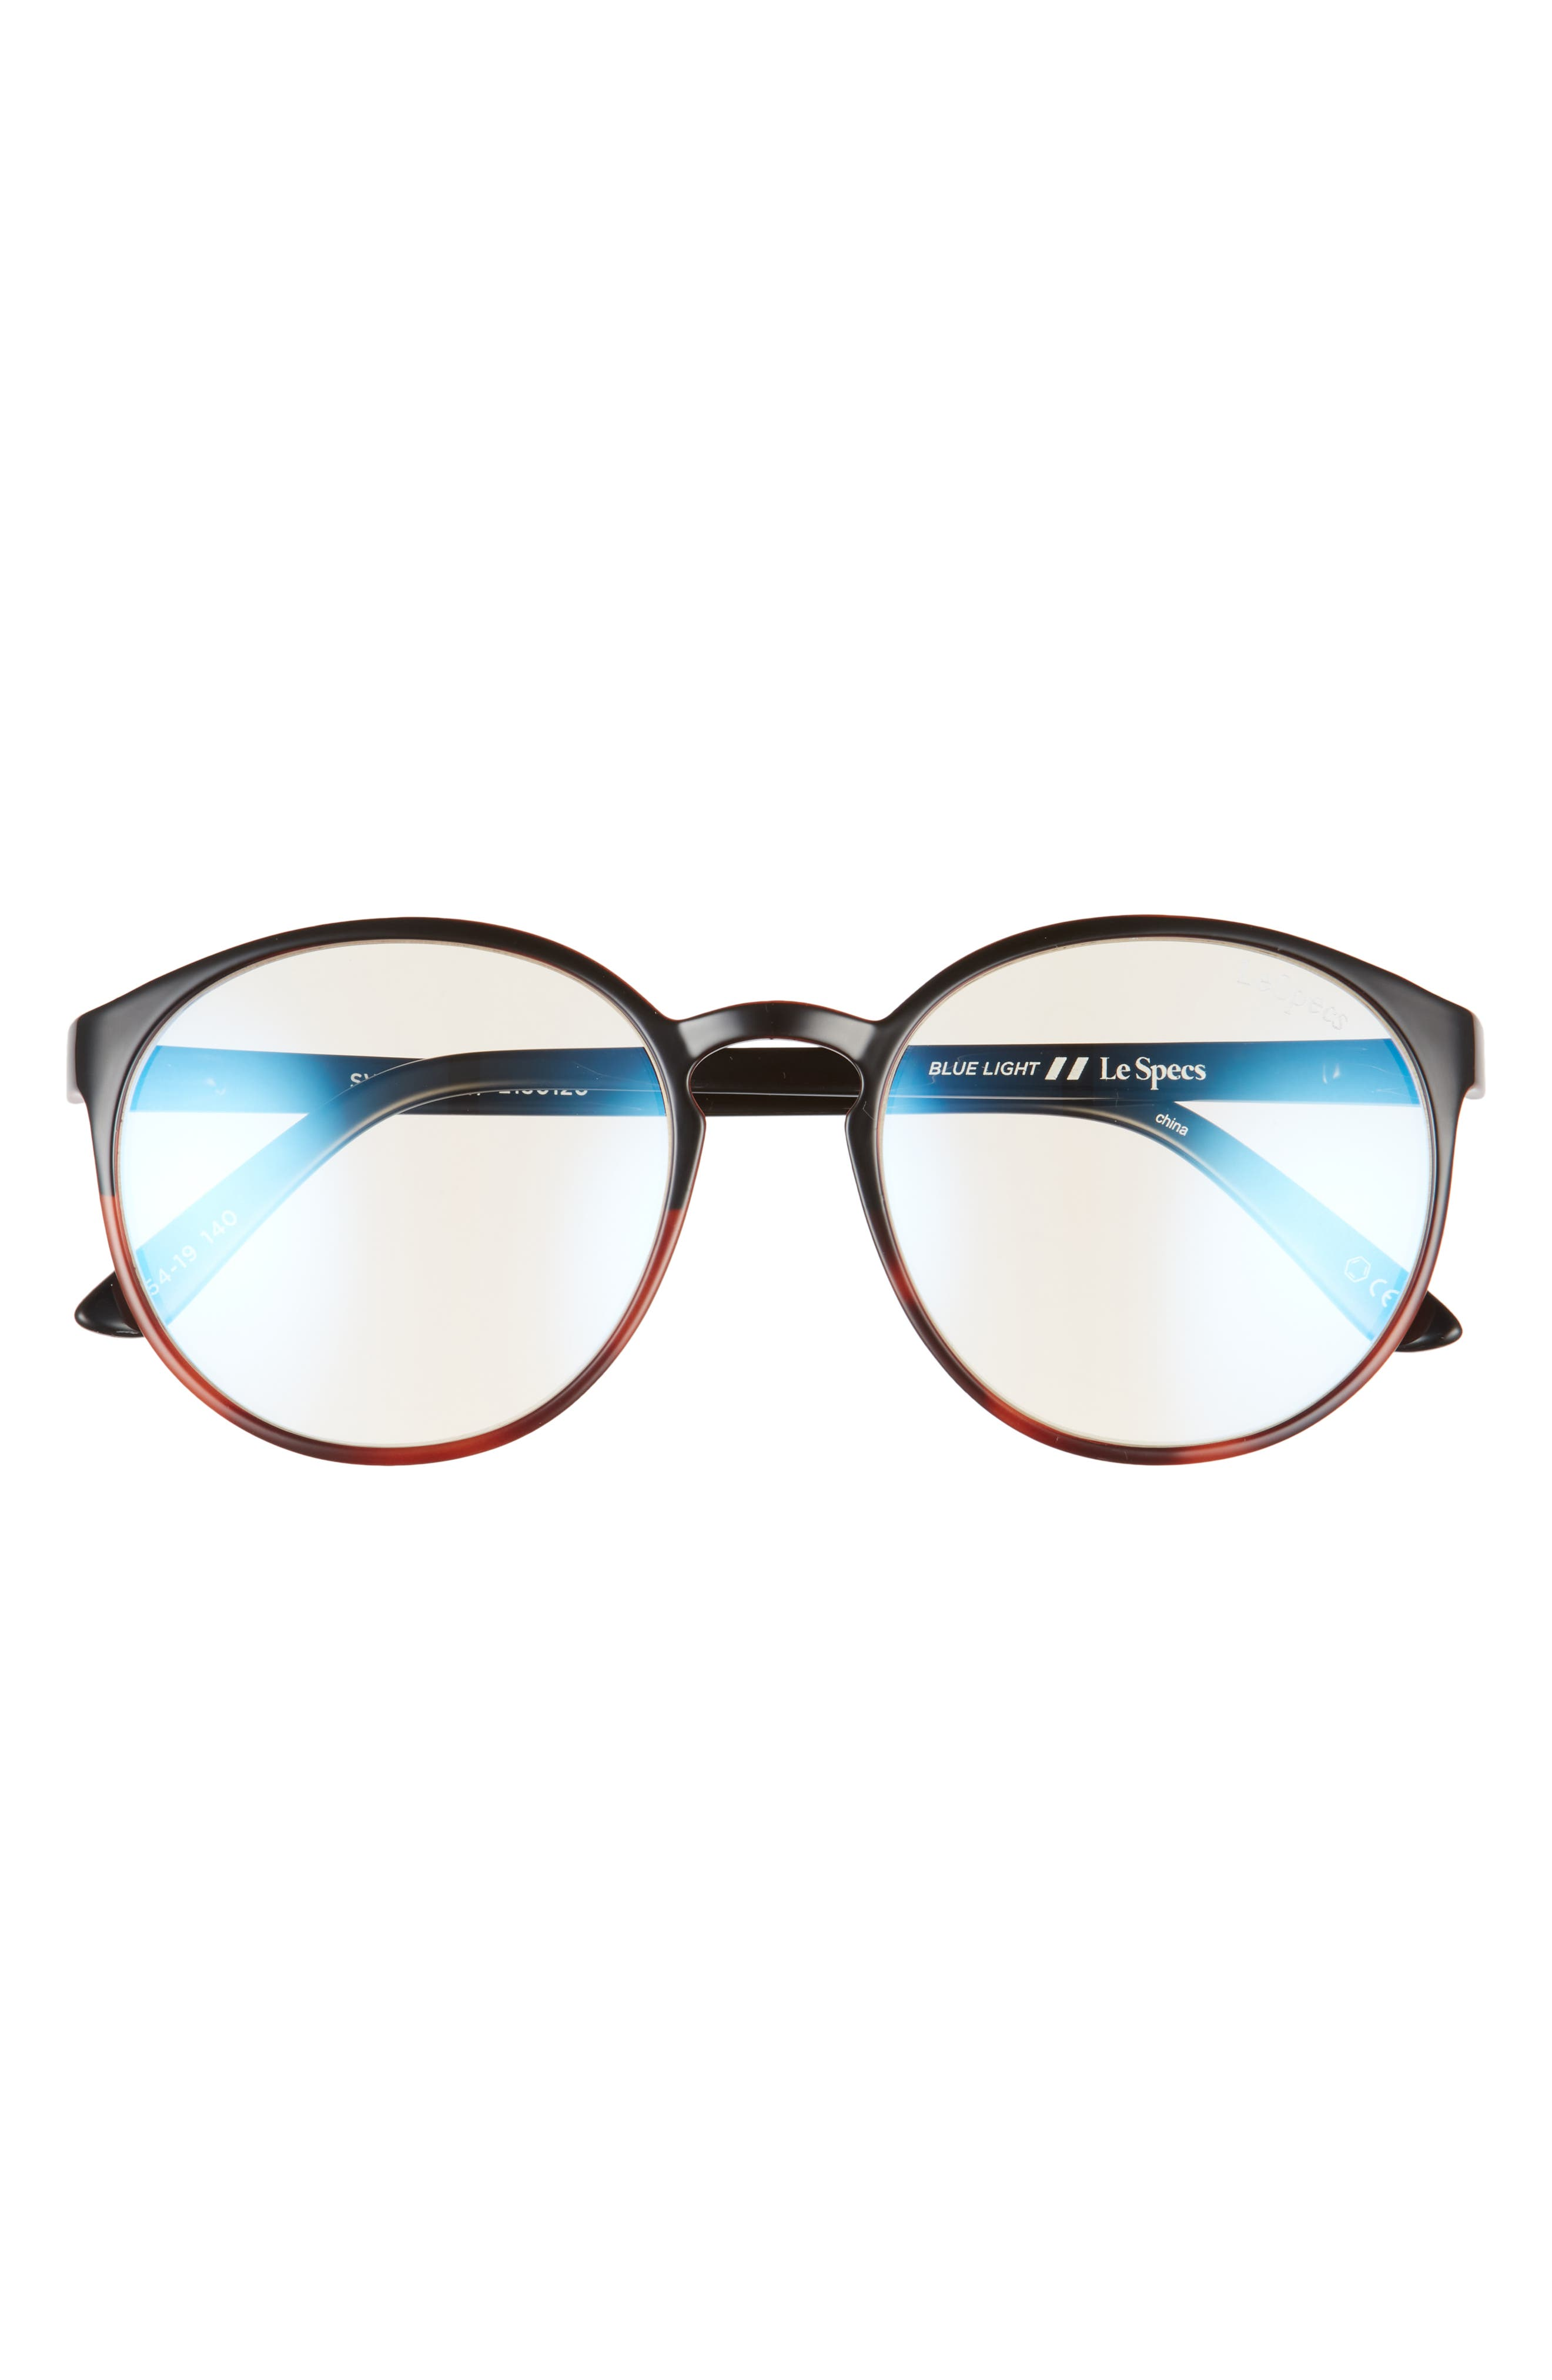 Swizzle 50mm Small Blue Light Blocking Glasses